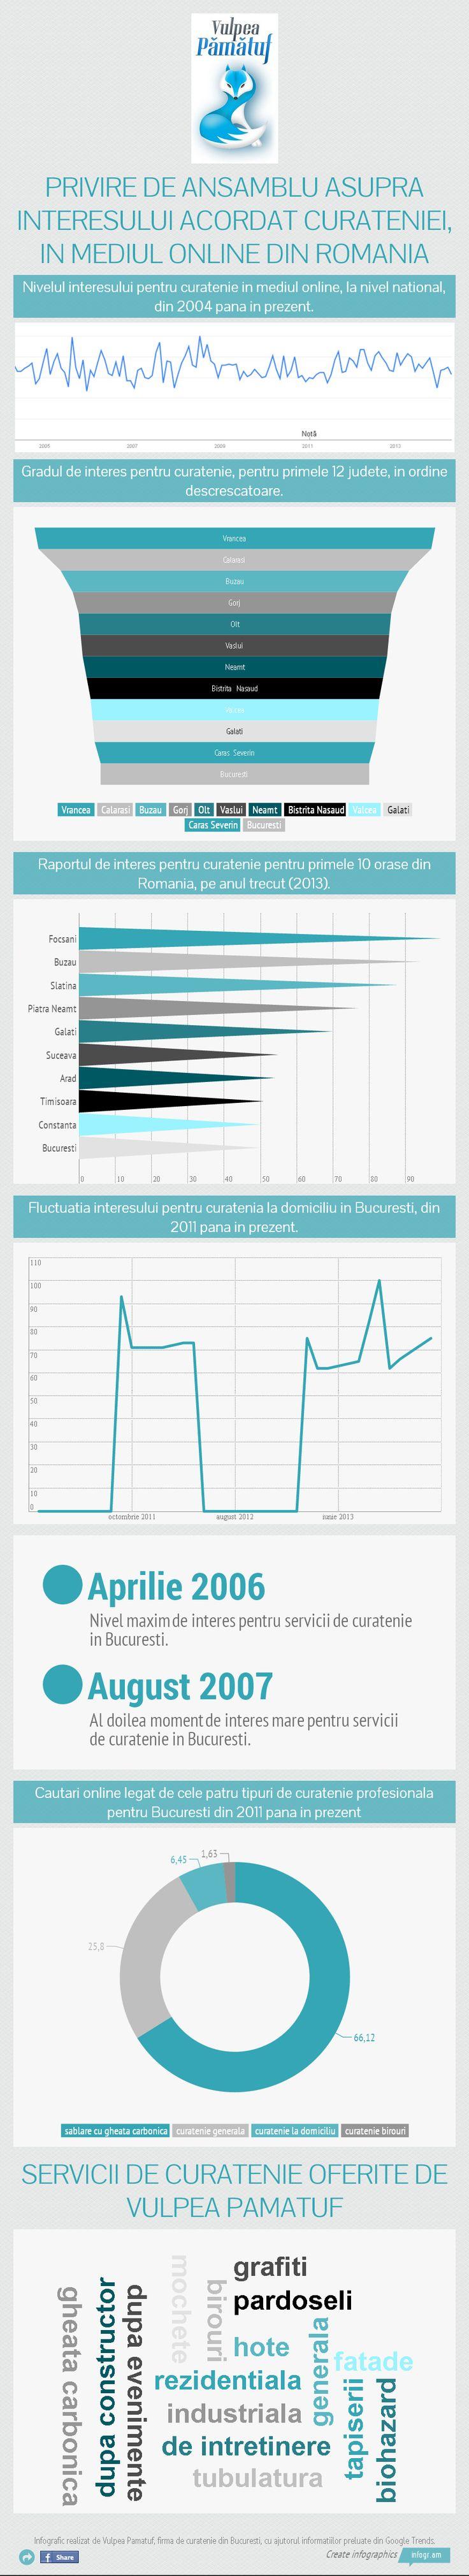 infographic curatenie